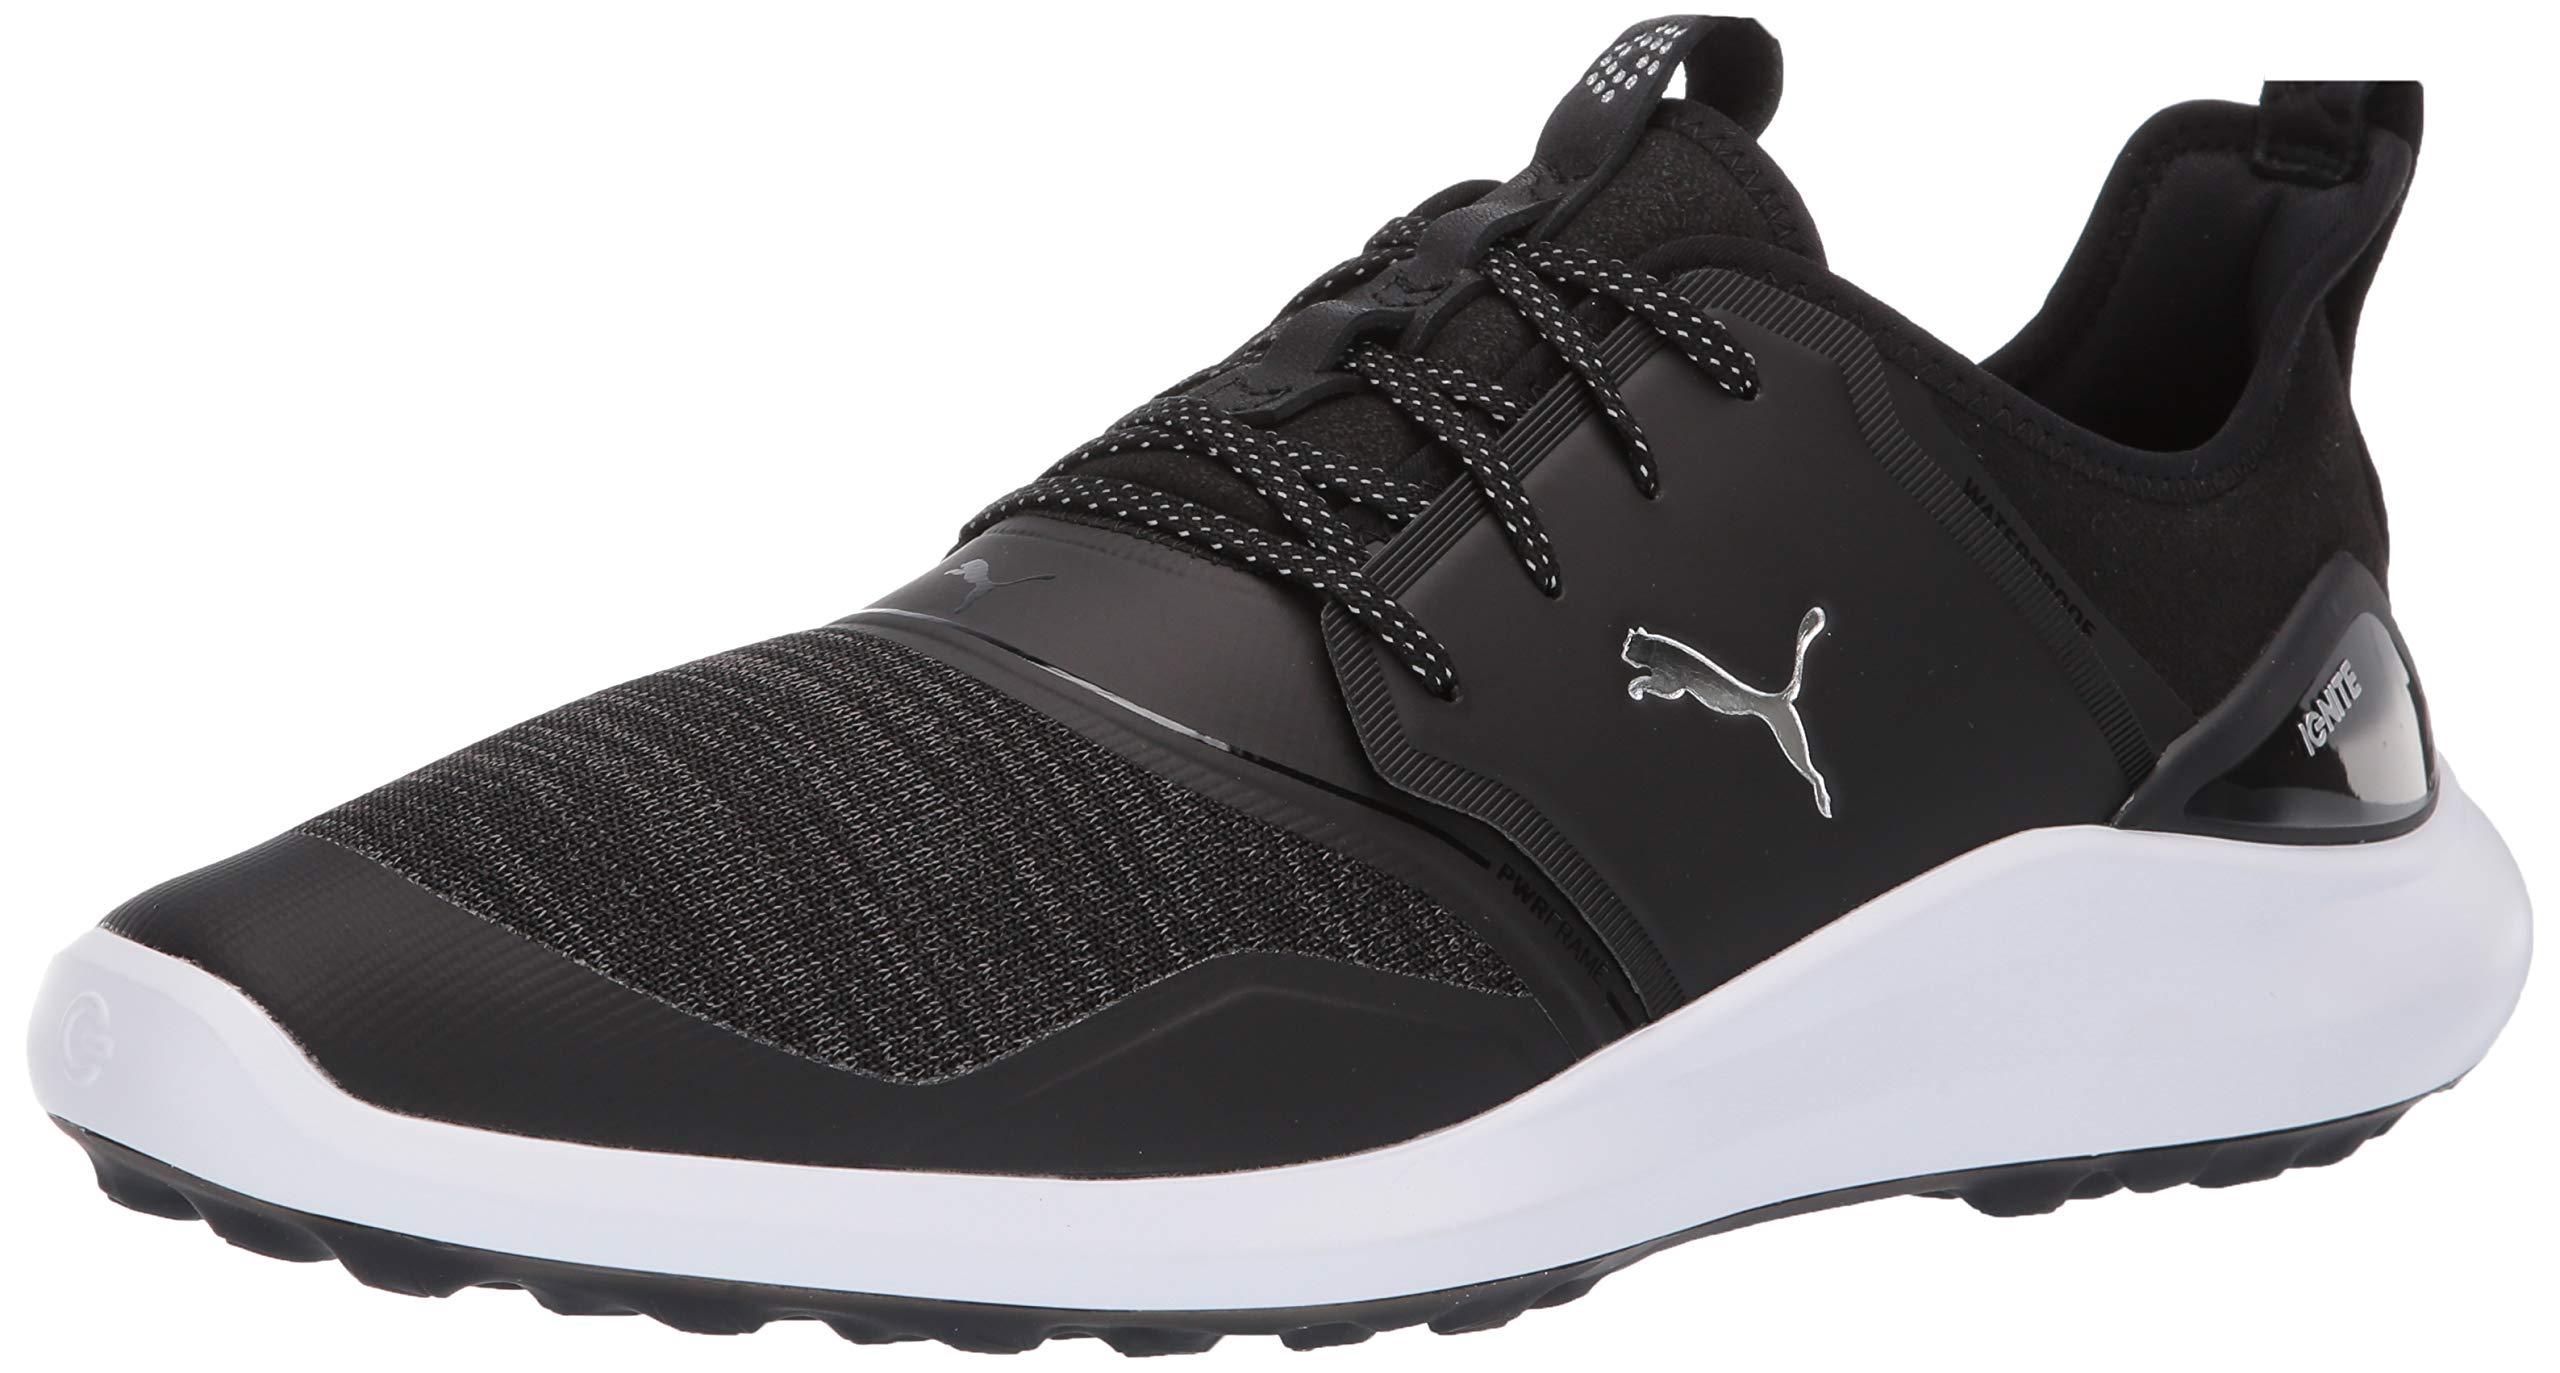 Puma Golf Men's Ignite Nxt Lace Golf Shoe Black Silver-Puma White, 10 M US by PUMA